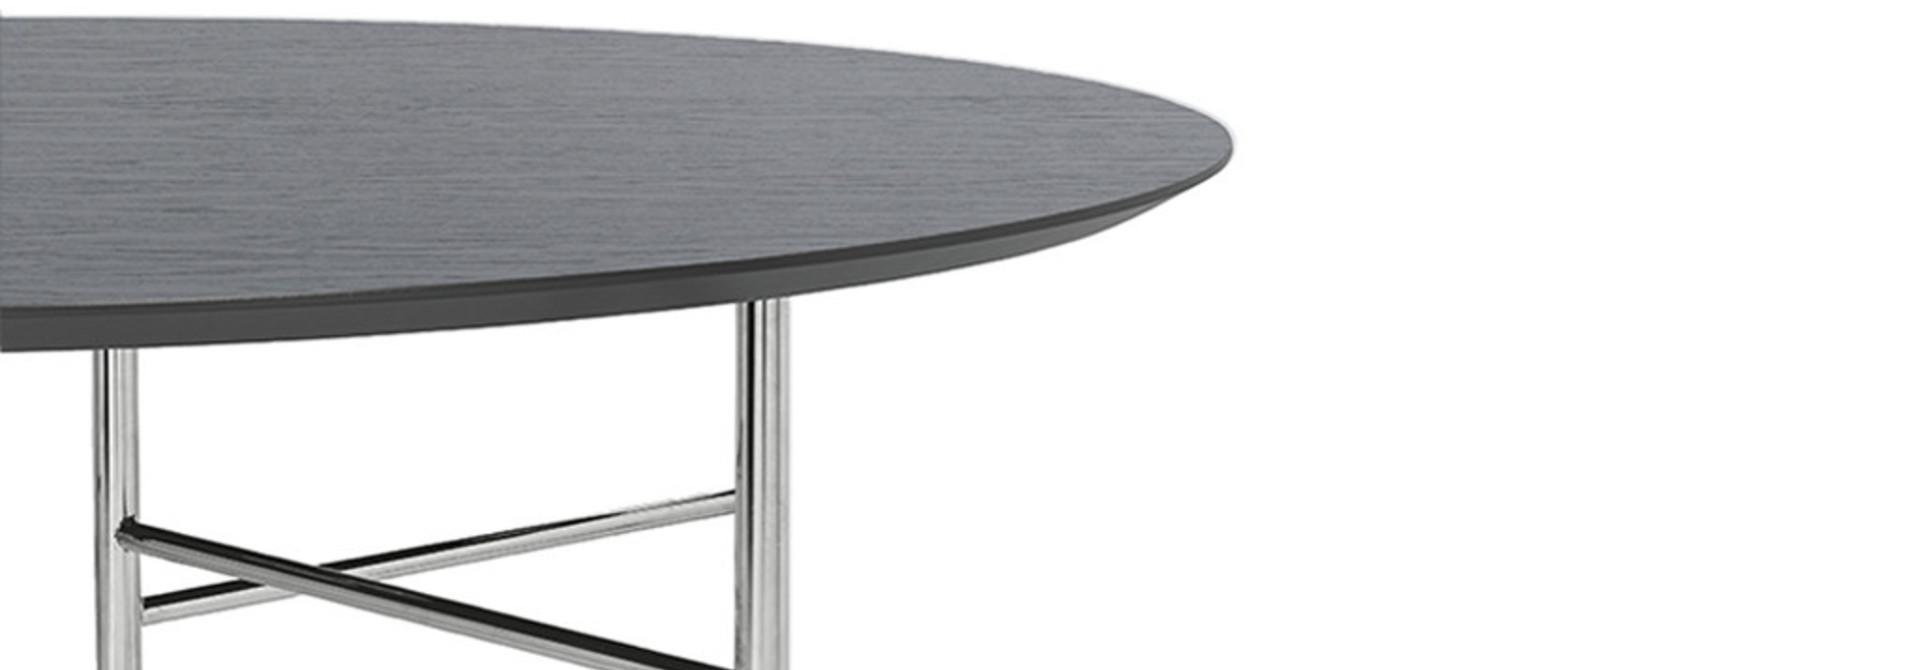 Mingle Table Top - 130 cm